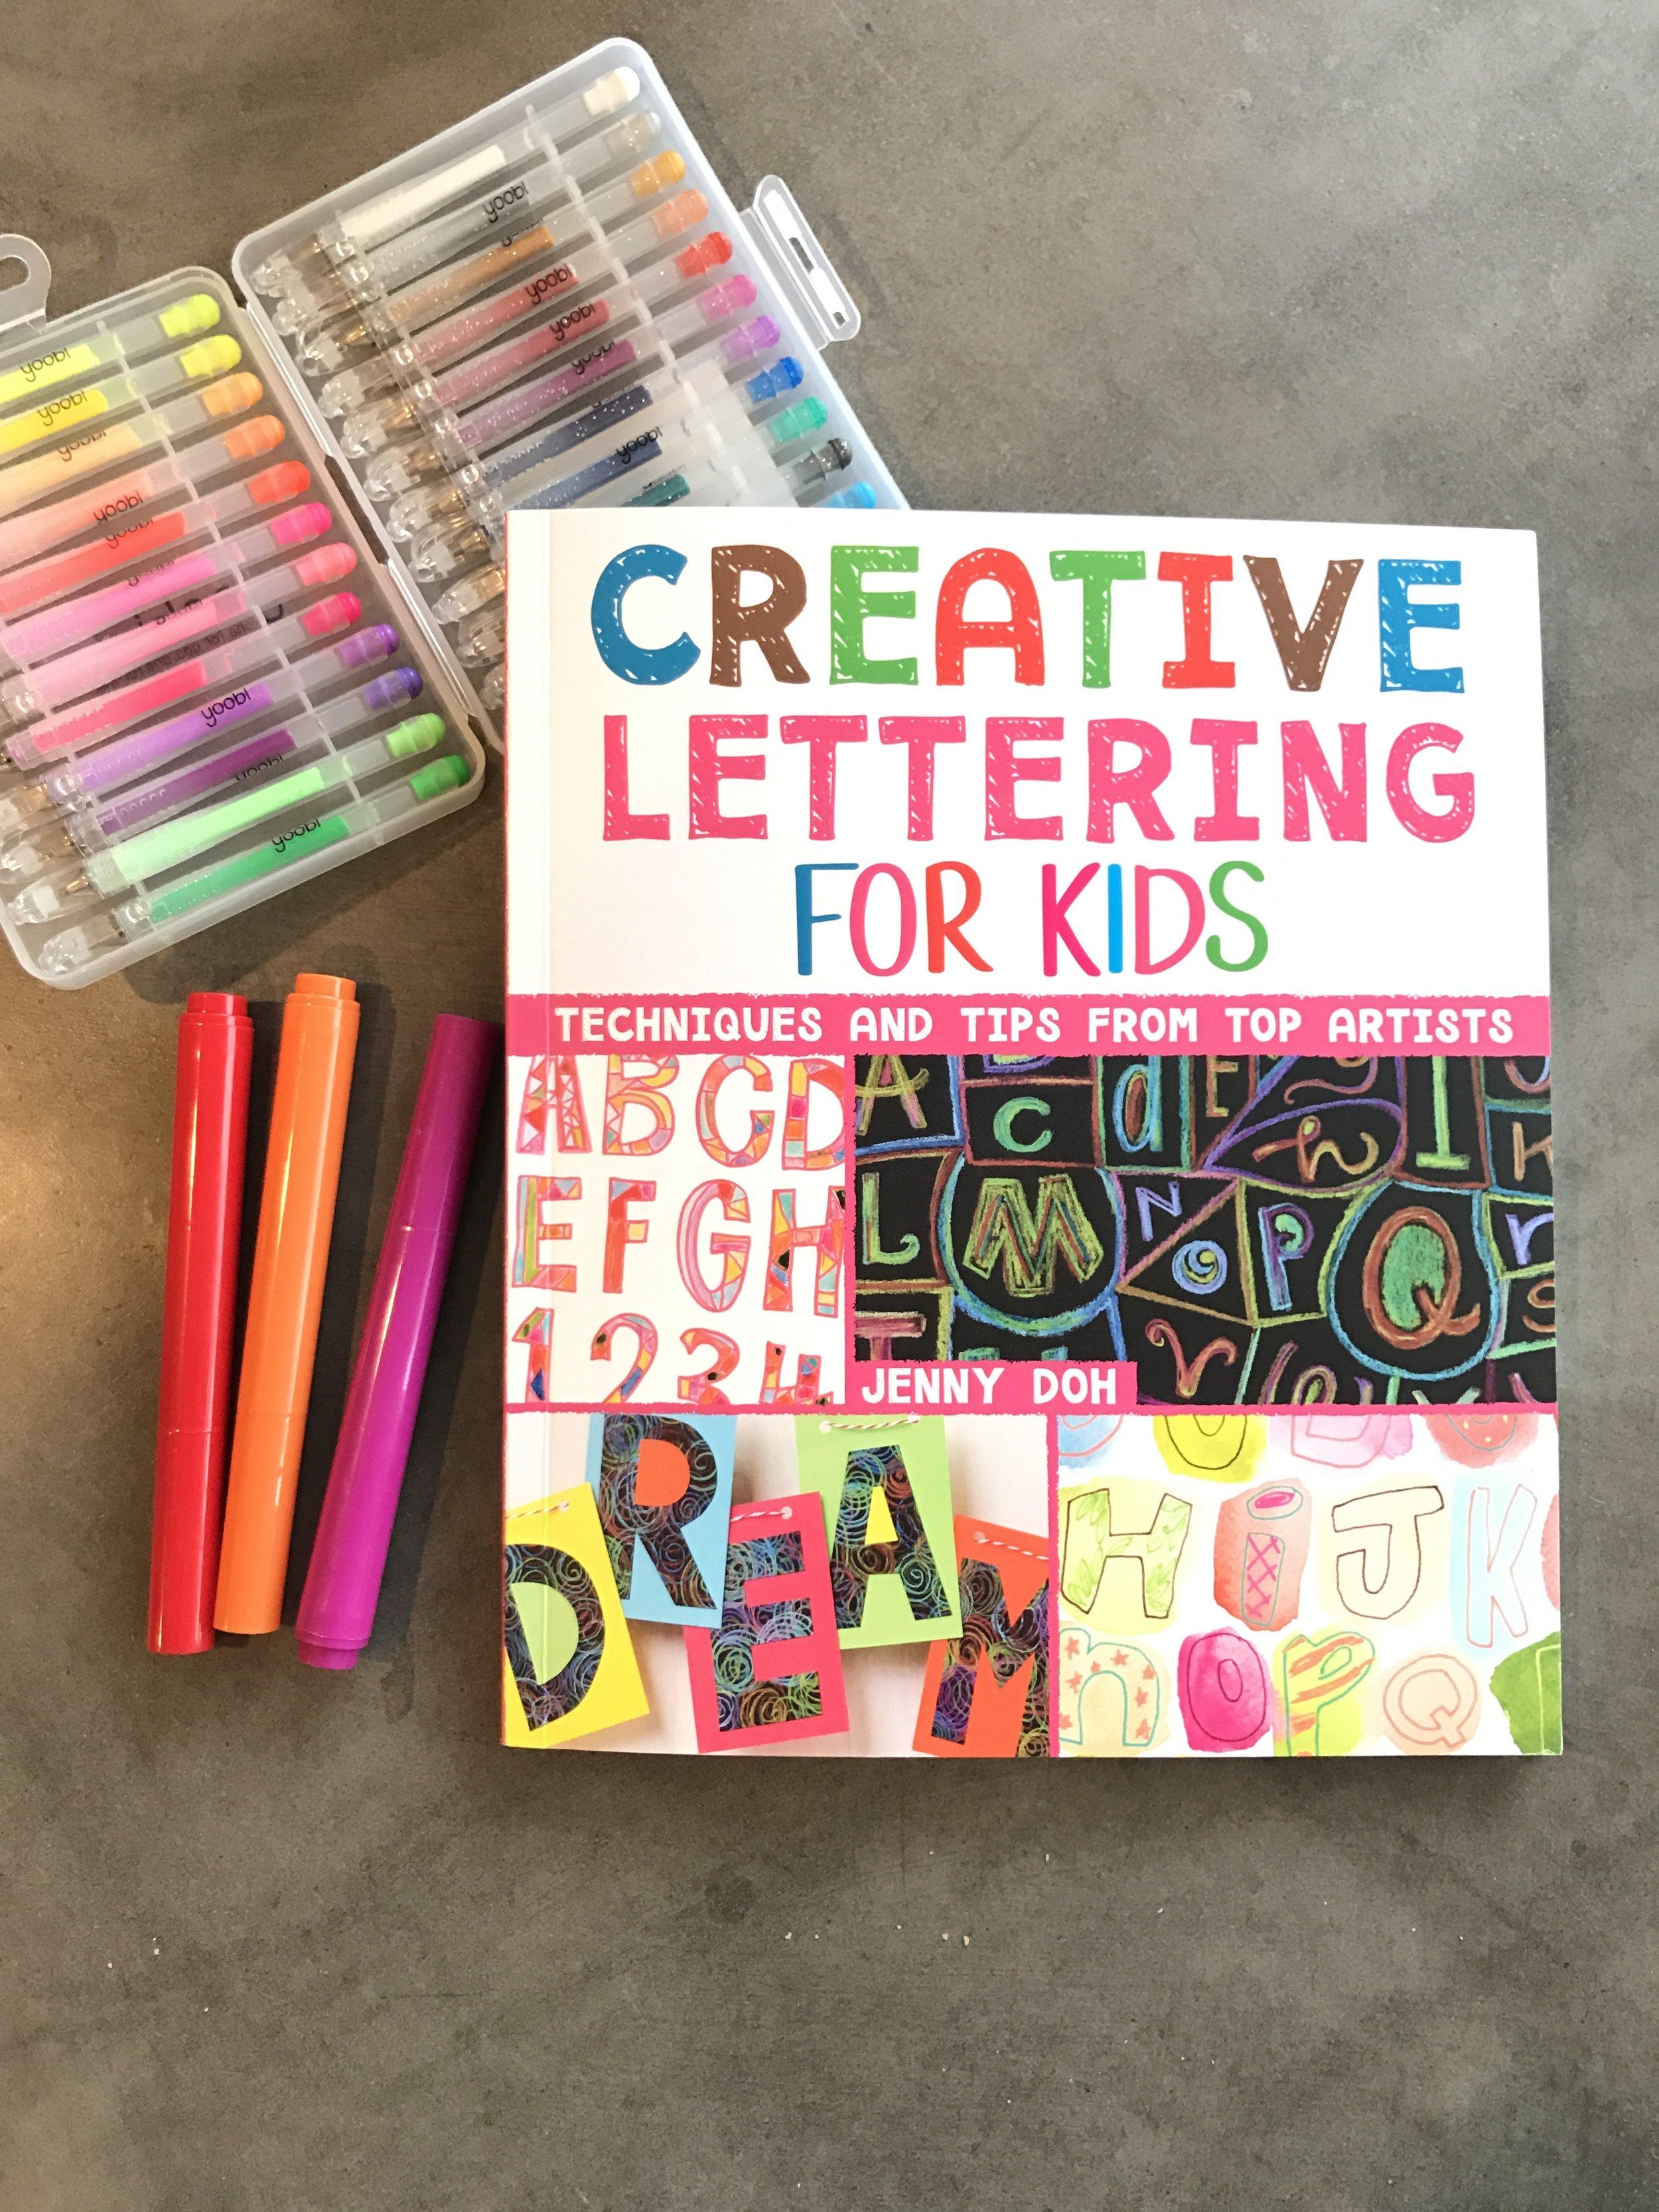 Creative Lettering book!